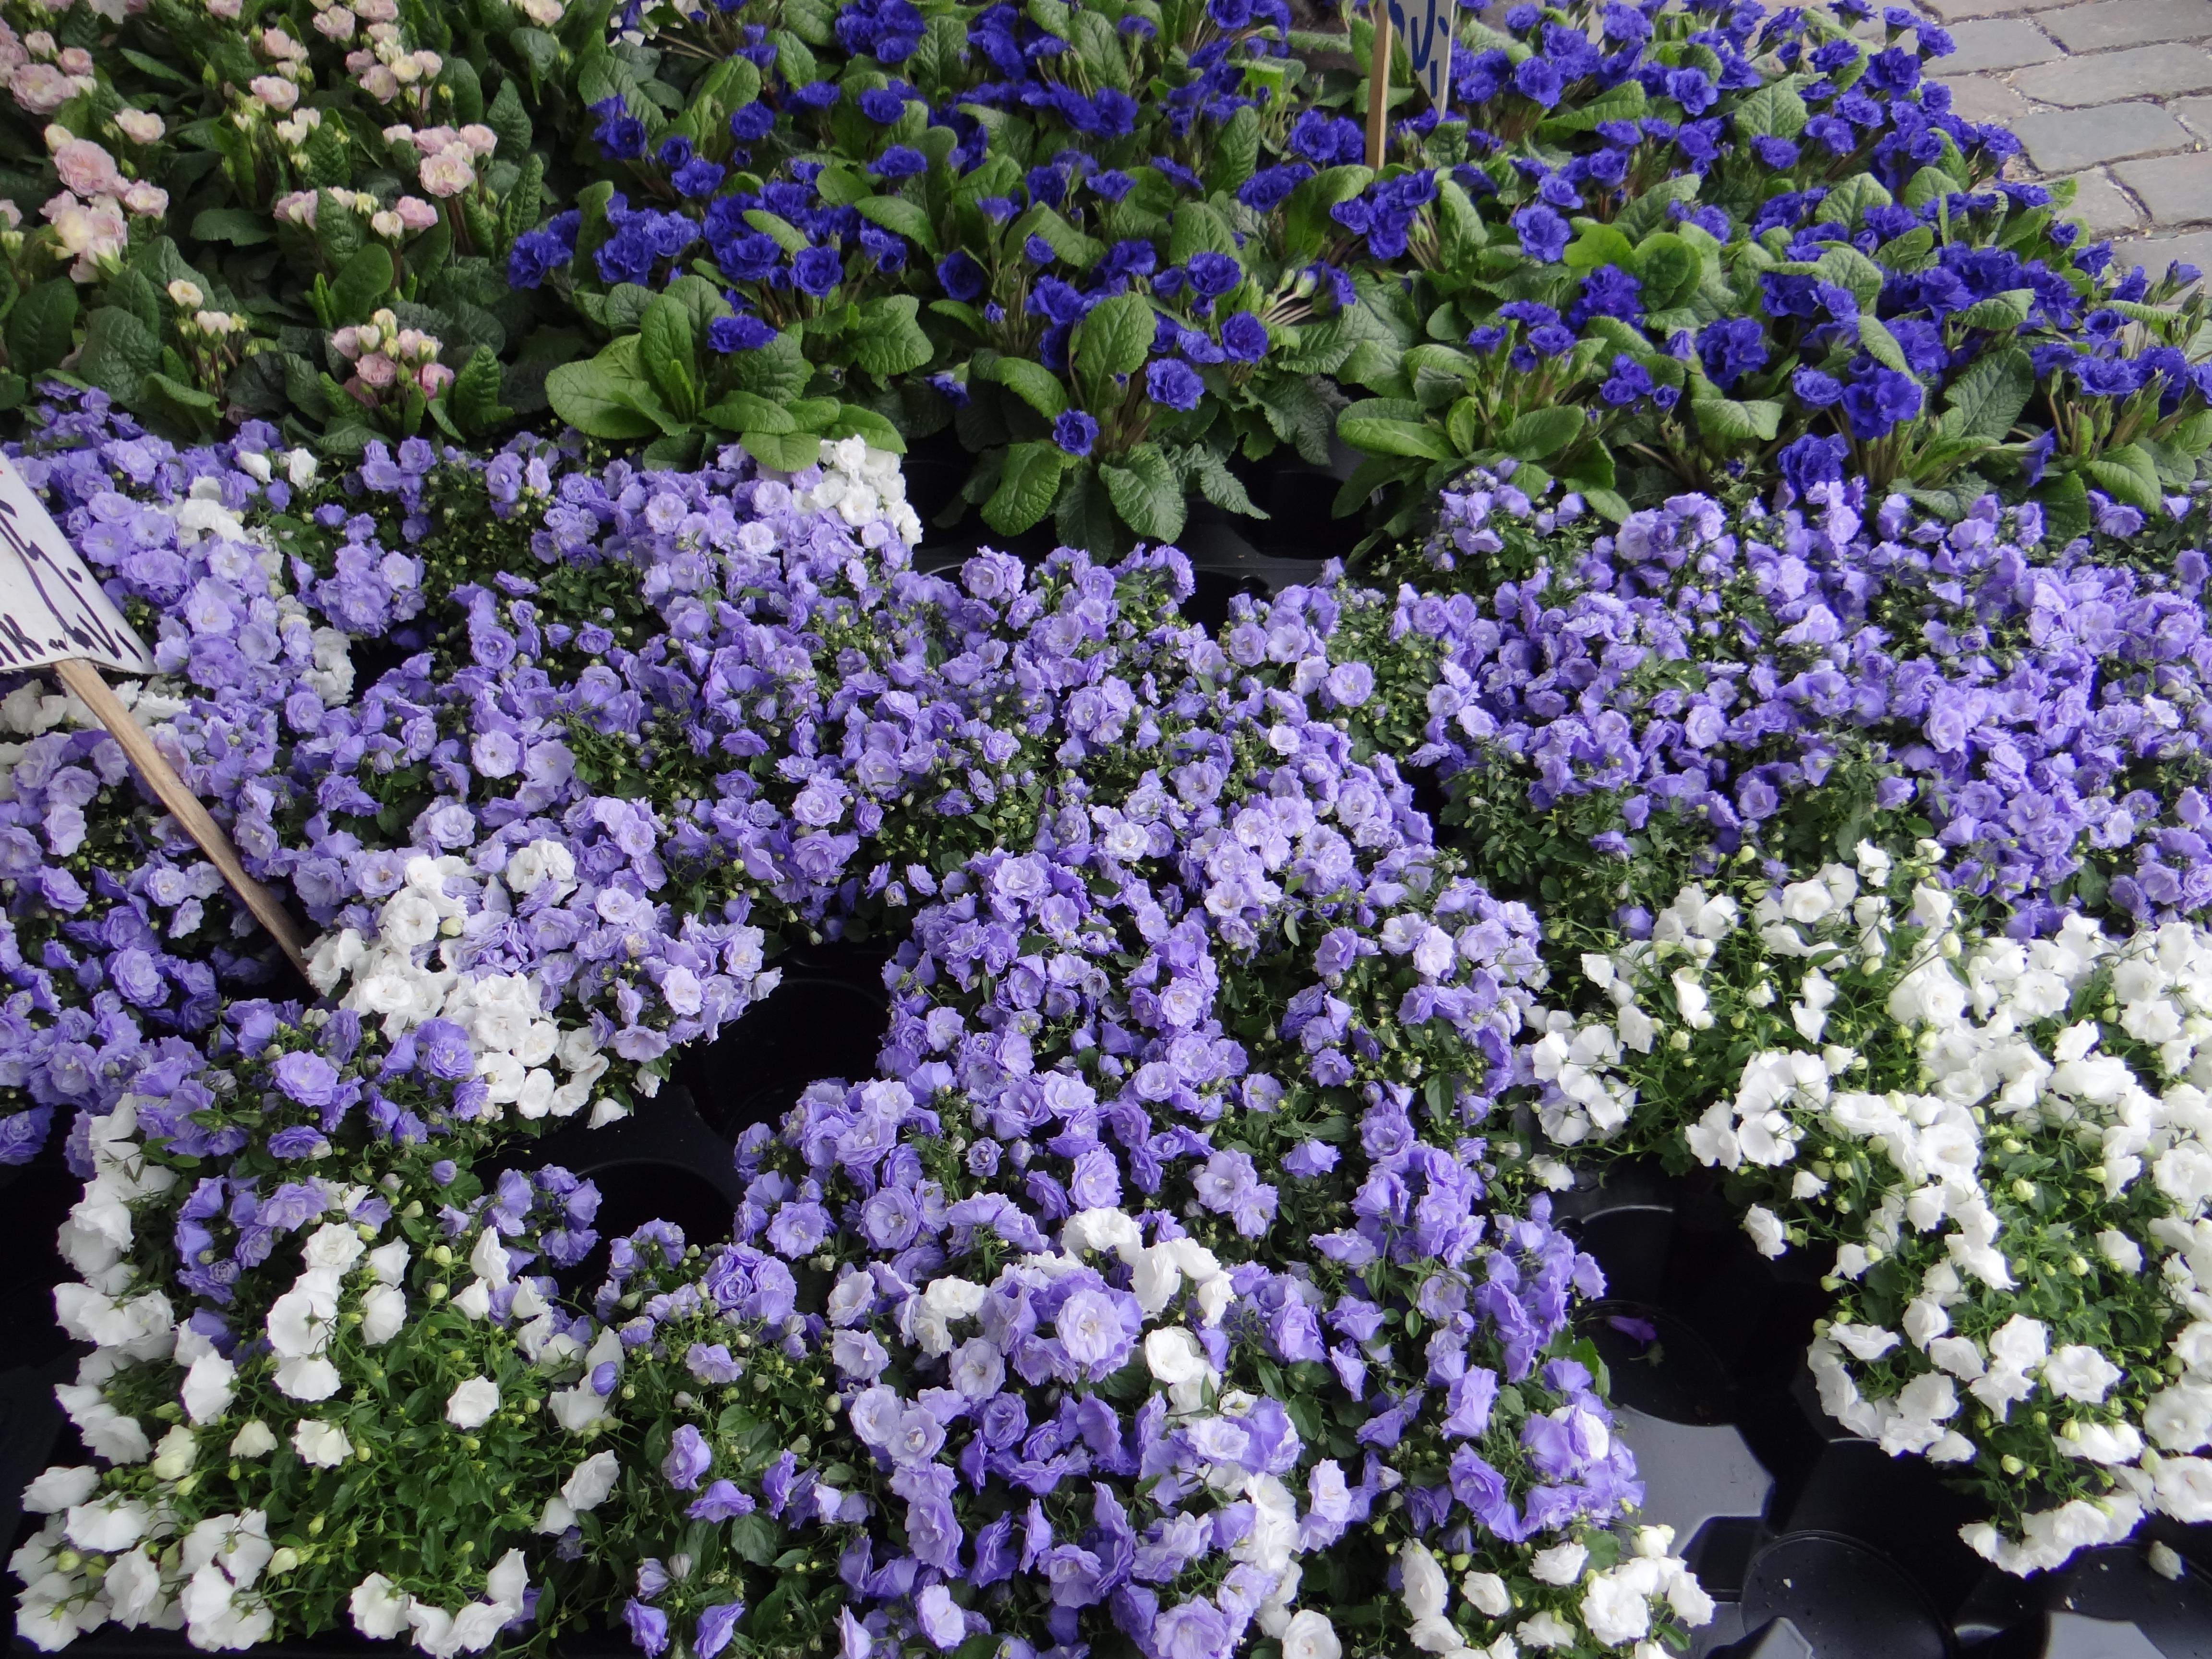 Free Images White Spring Pink Flowers Flower Market Shrub